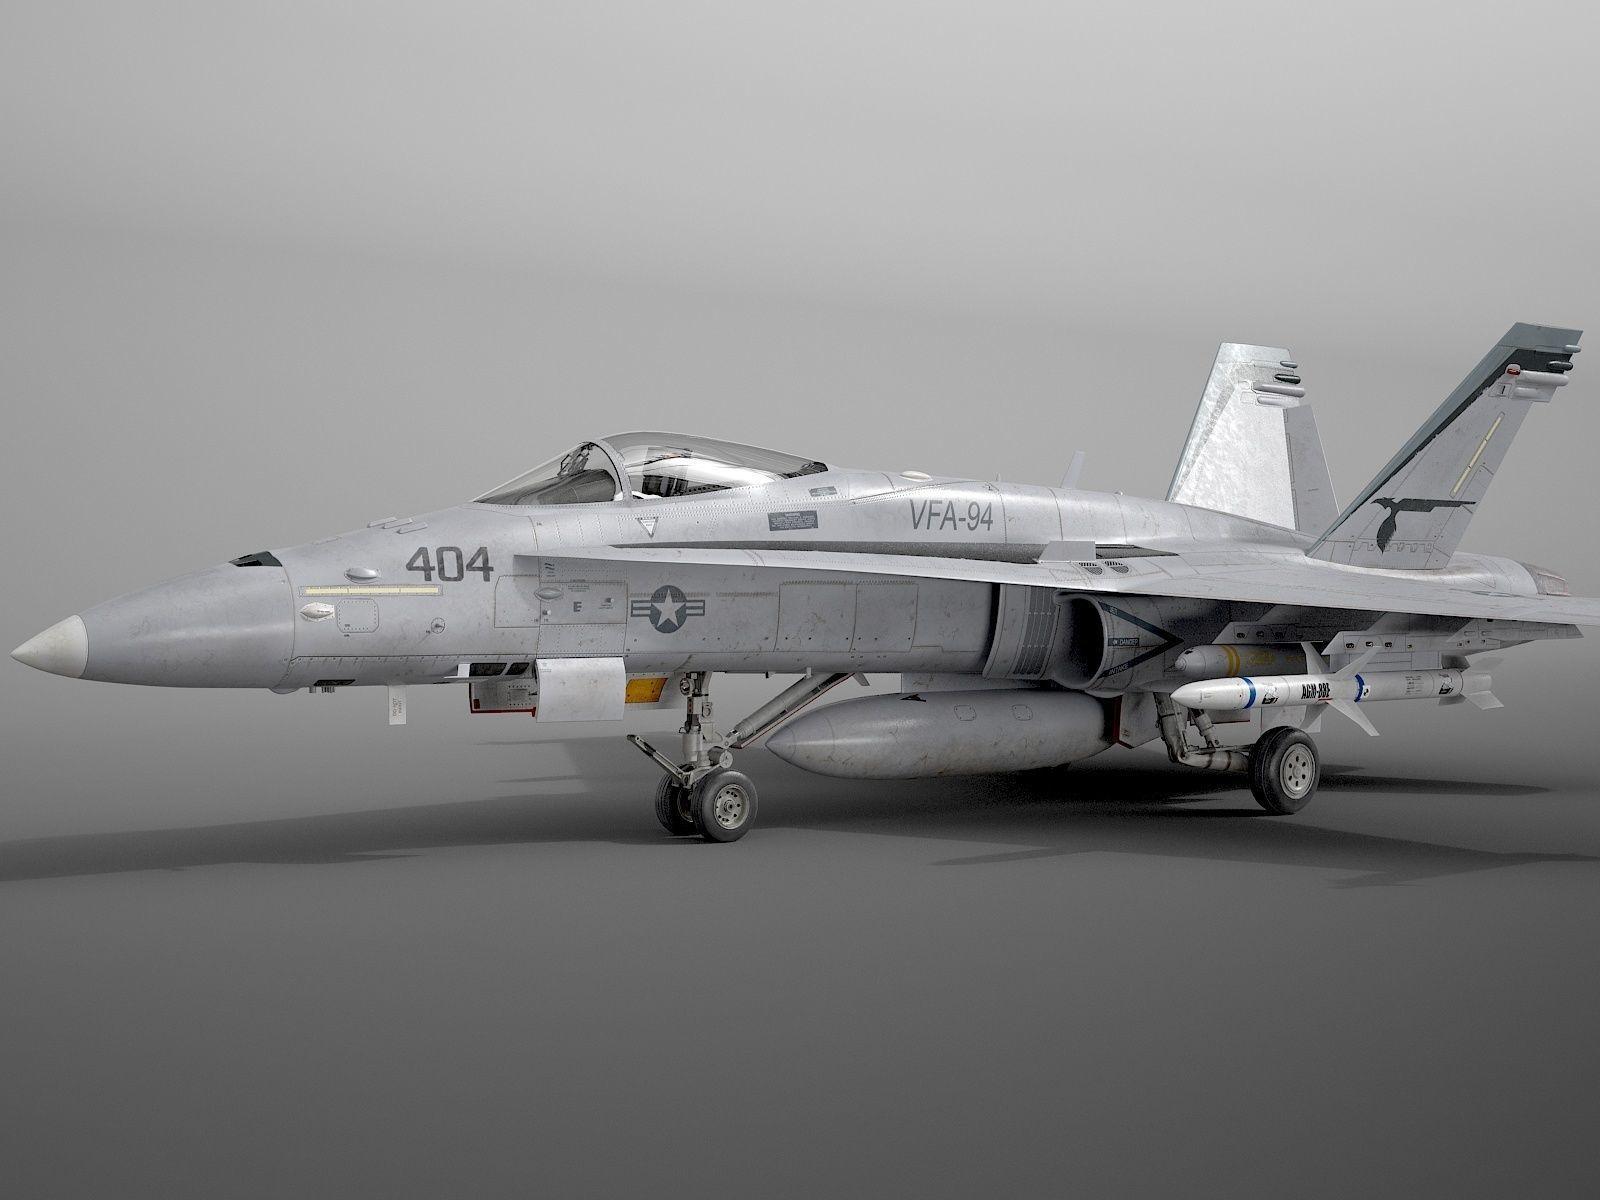 McDonnell Douglas FA-18C Hornet rigged